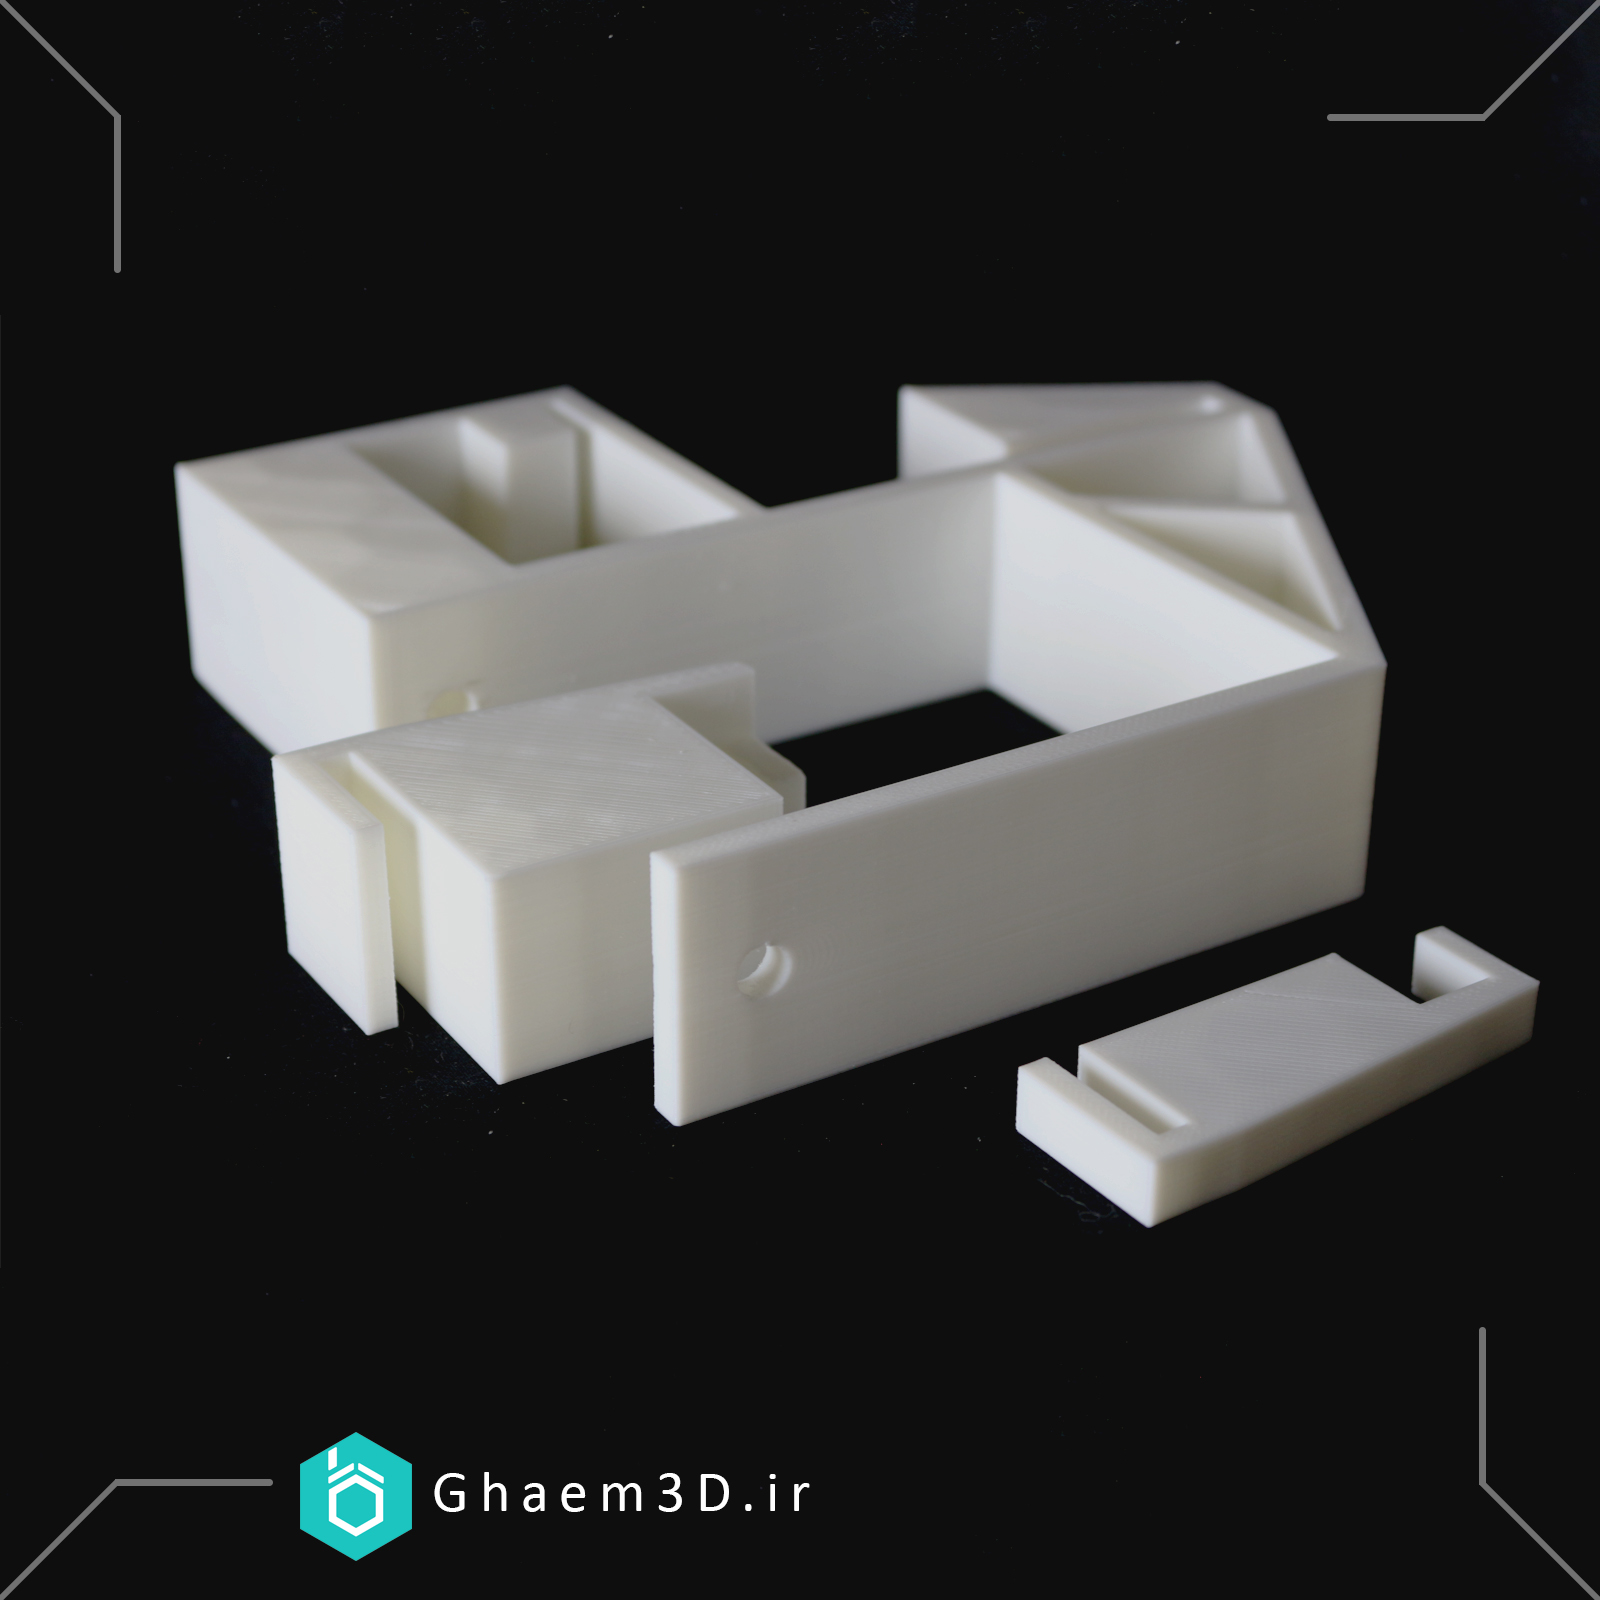 پرینت سه بعدی قطعه صنعتی